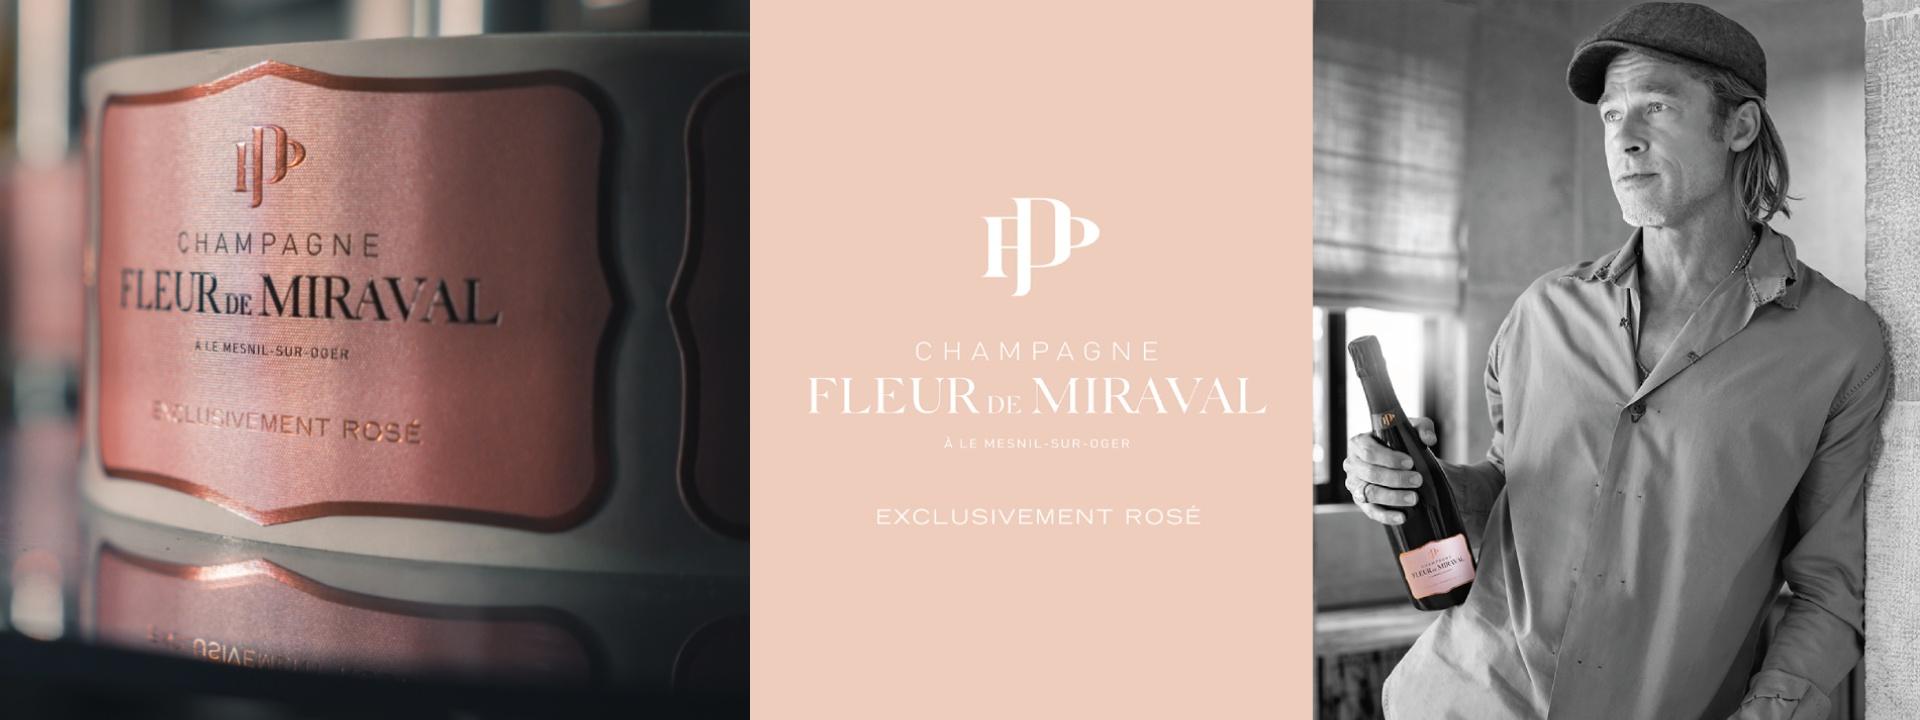 2021.02 Brad Pitt's Fleur de Miraval